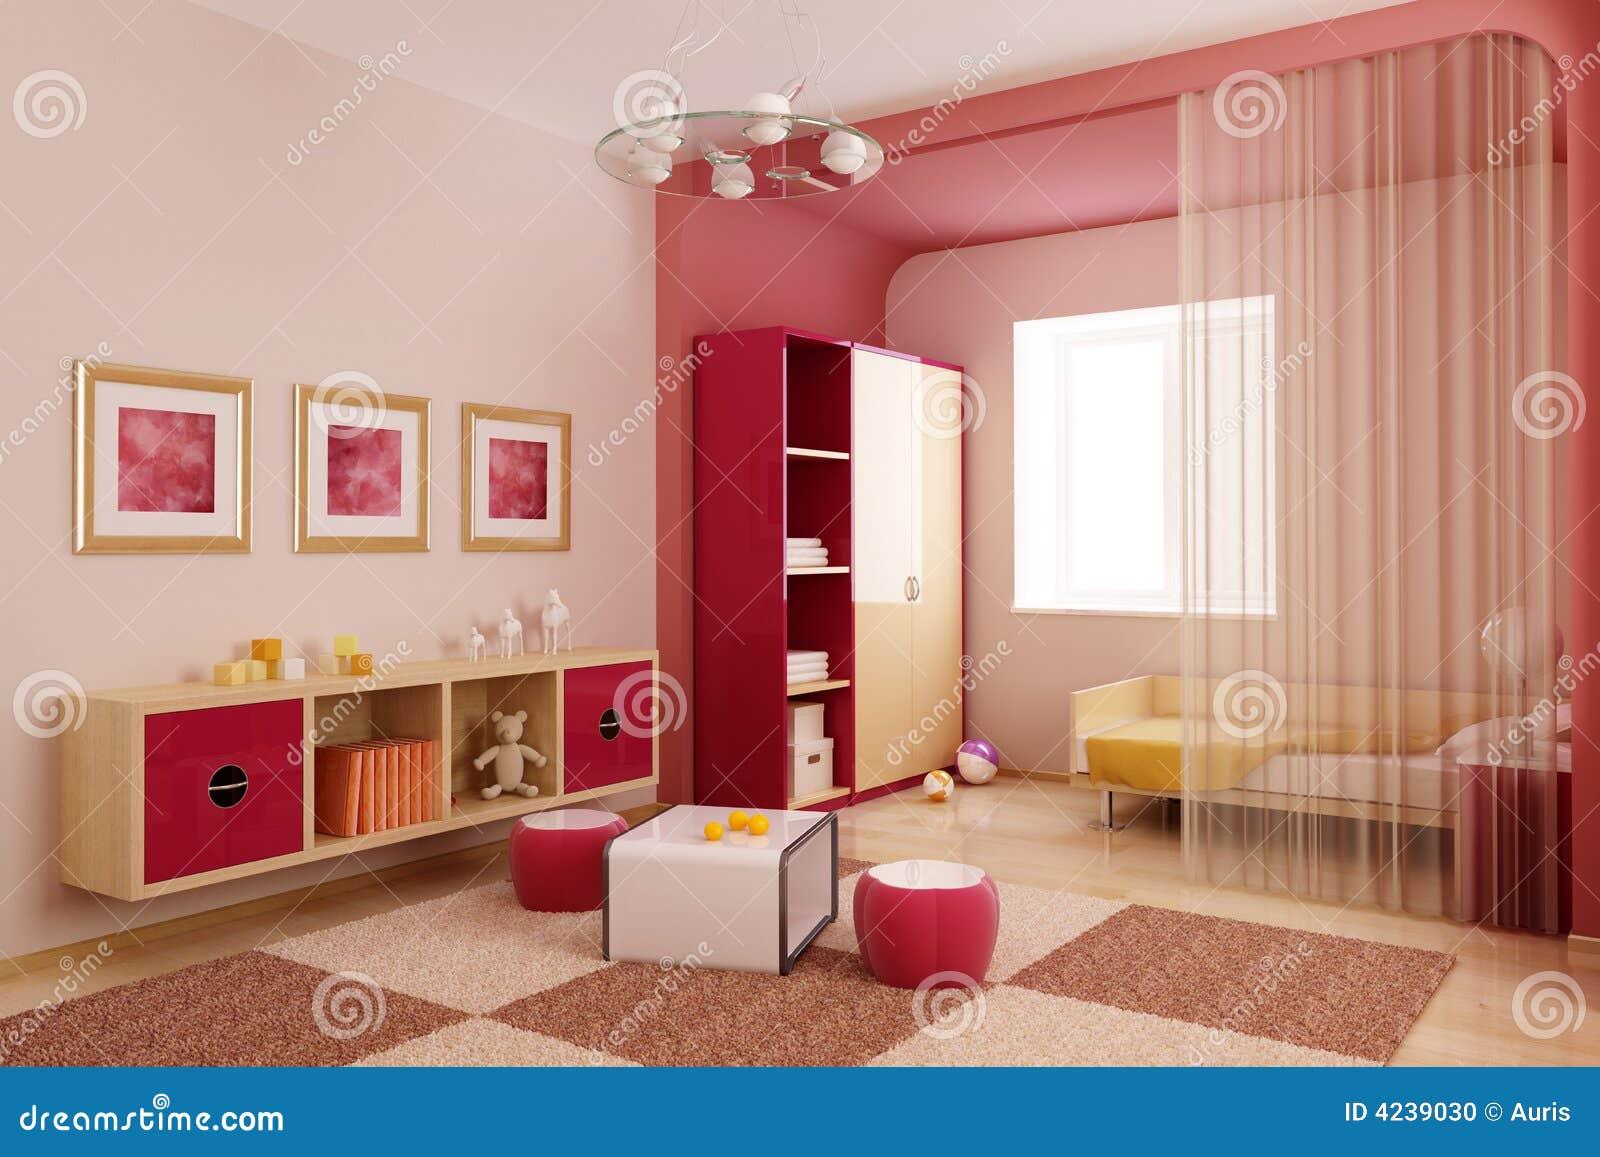 2d and 3d baby room interior design joy studio design for Room design 2d